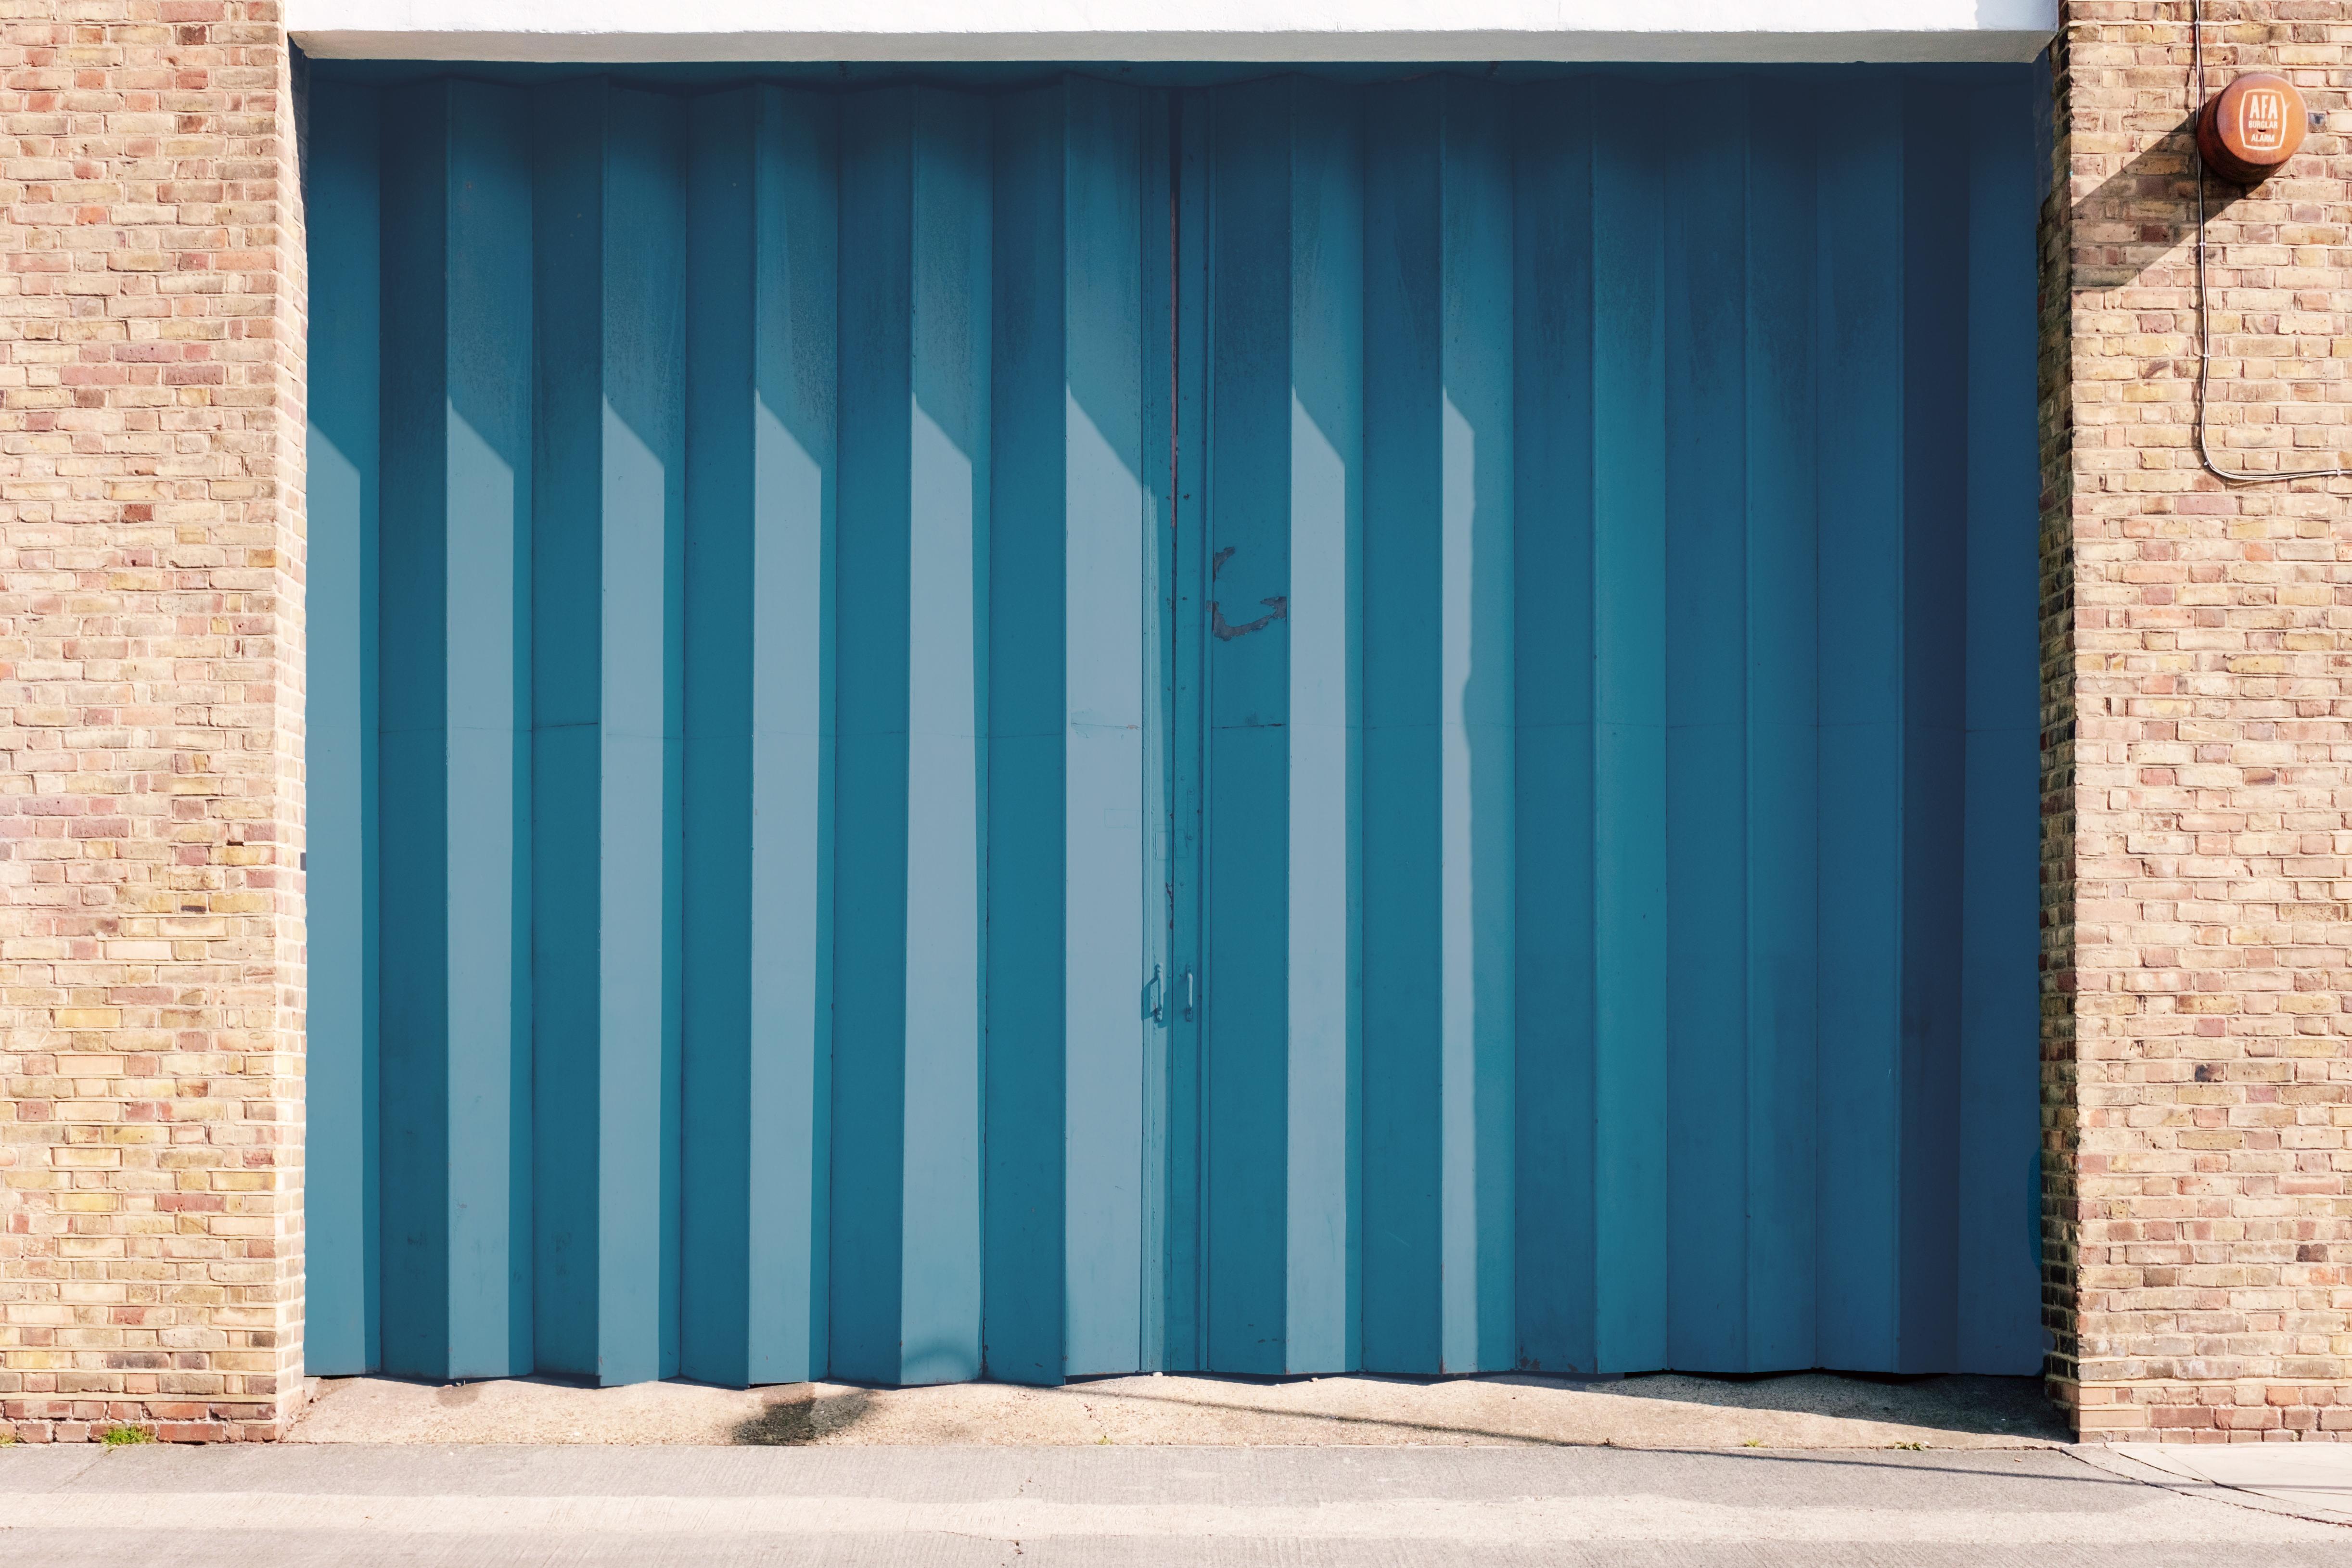 Floridians lack awareness of hurricane risks from garage doors, generators, insurance deductibles